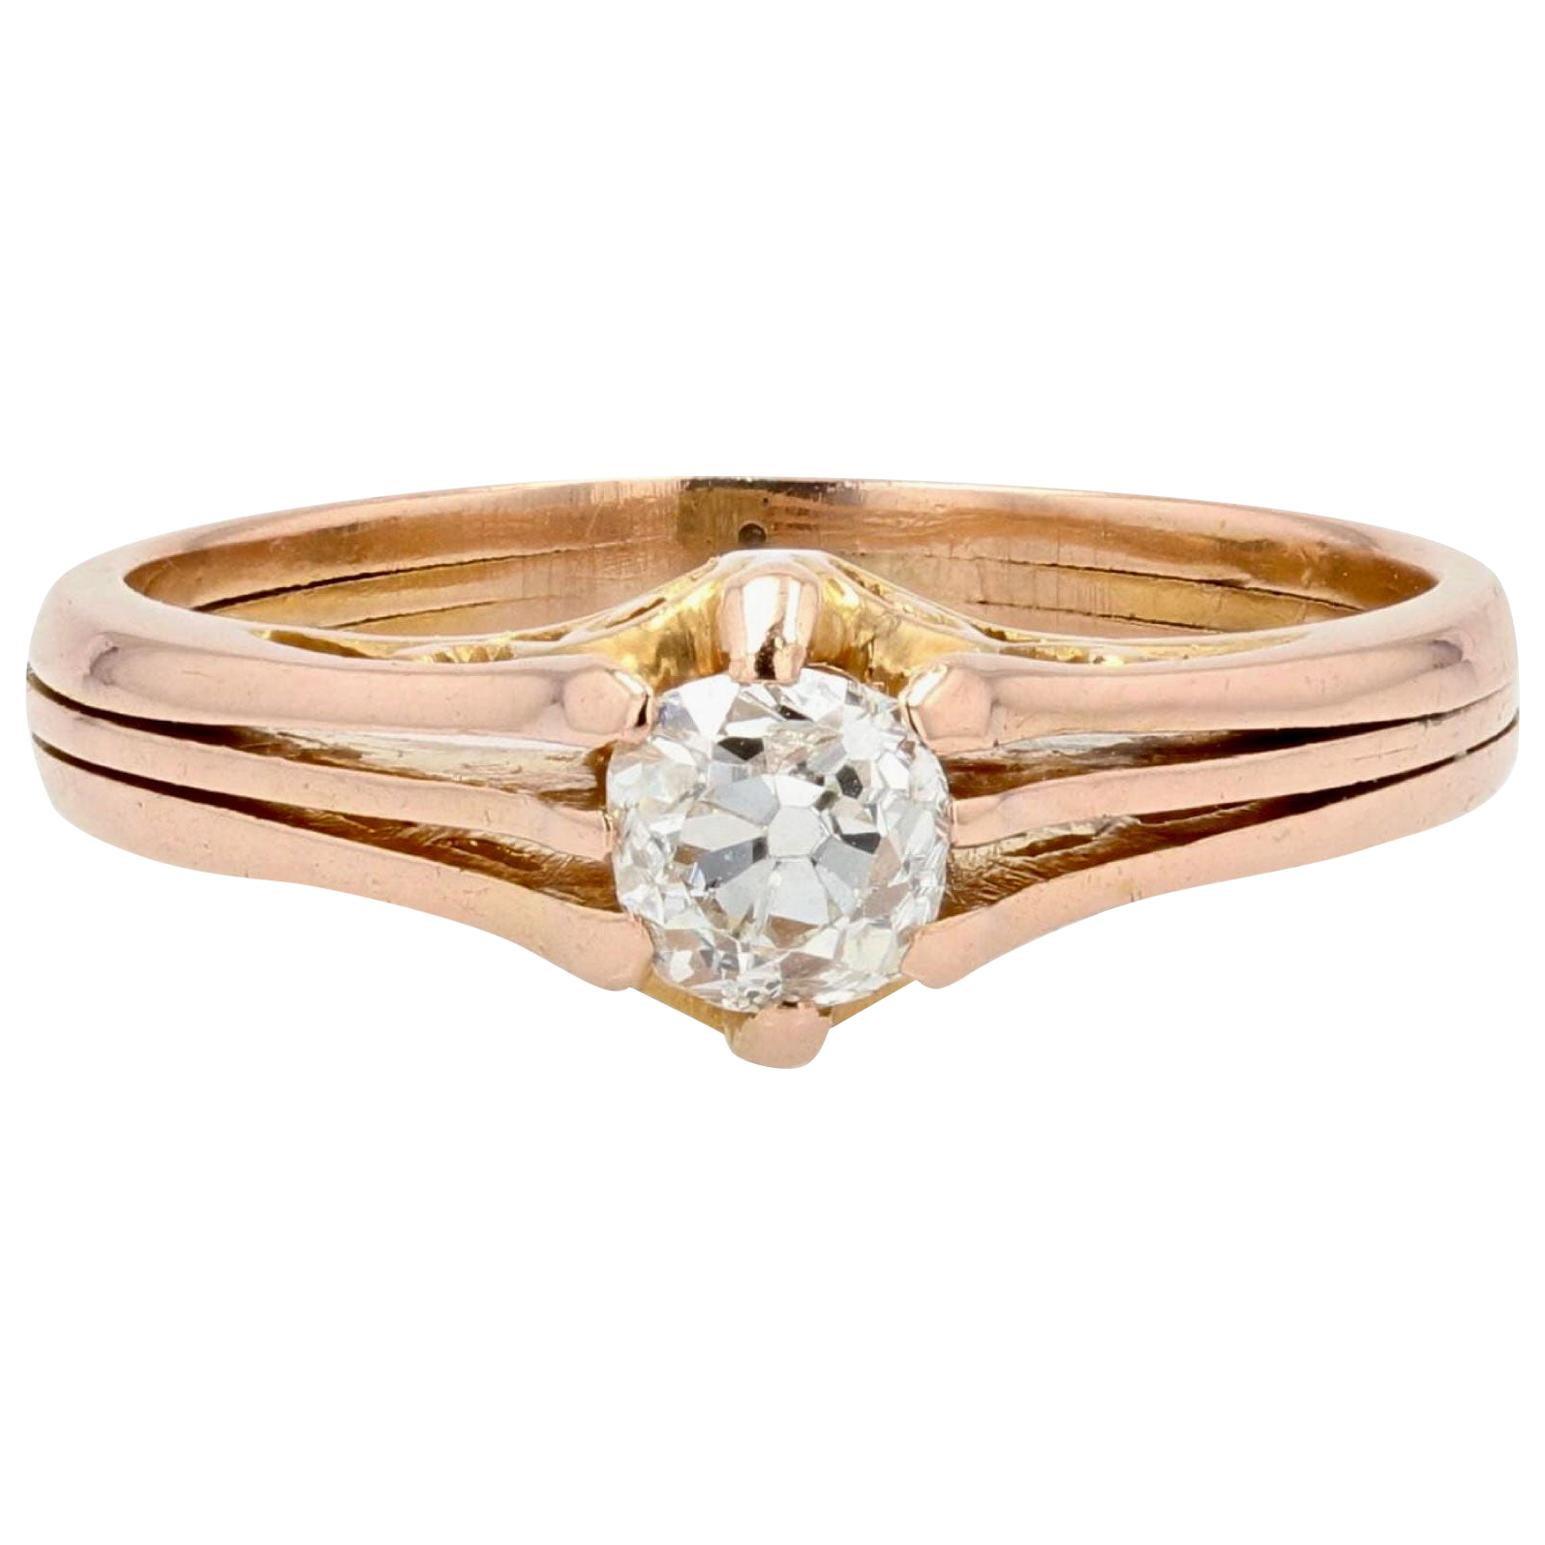 French 19th Century Diamond 18 Karat Rose Gold Solitaire Ring